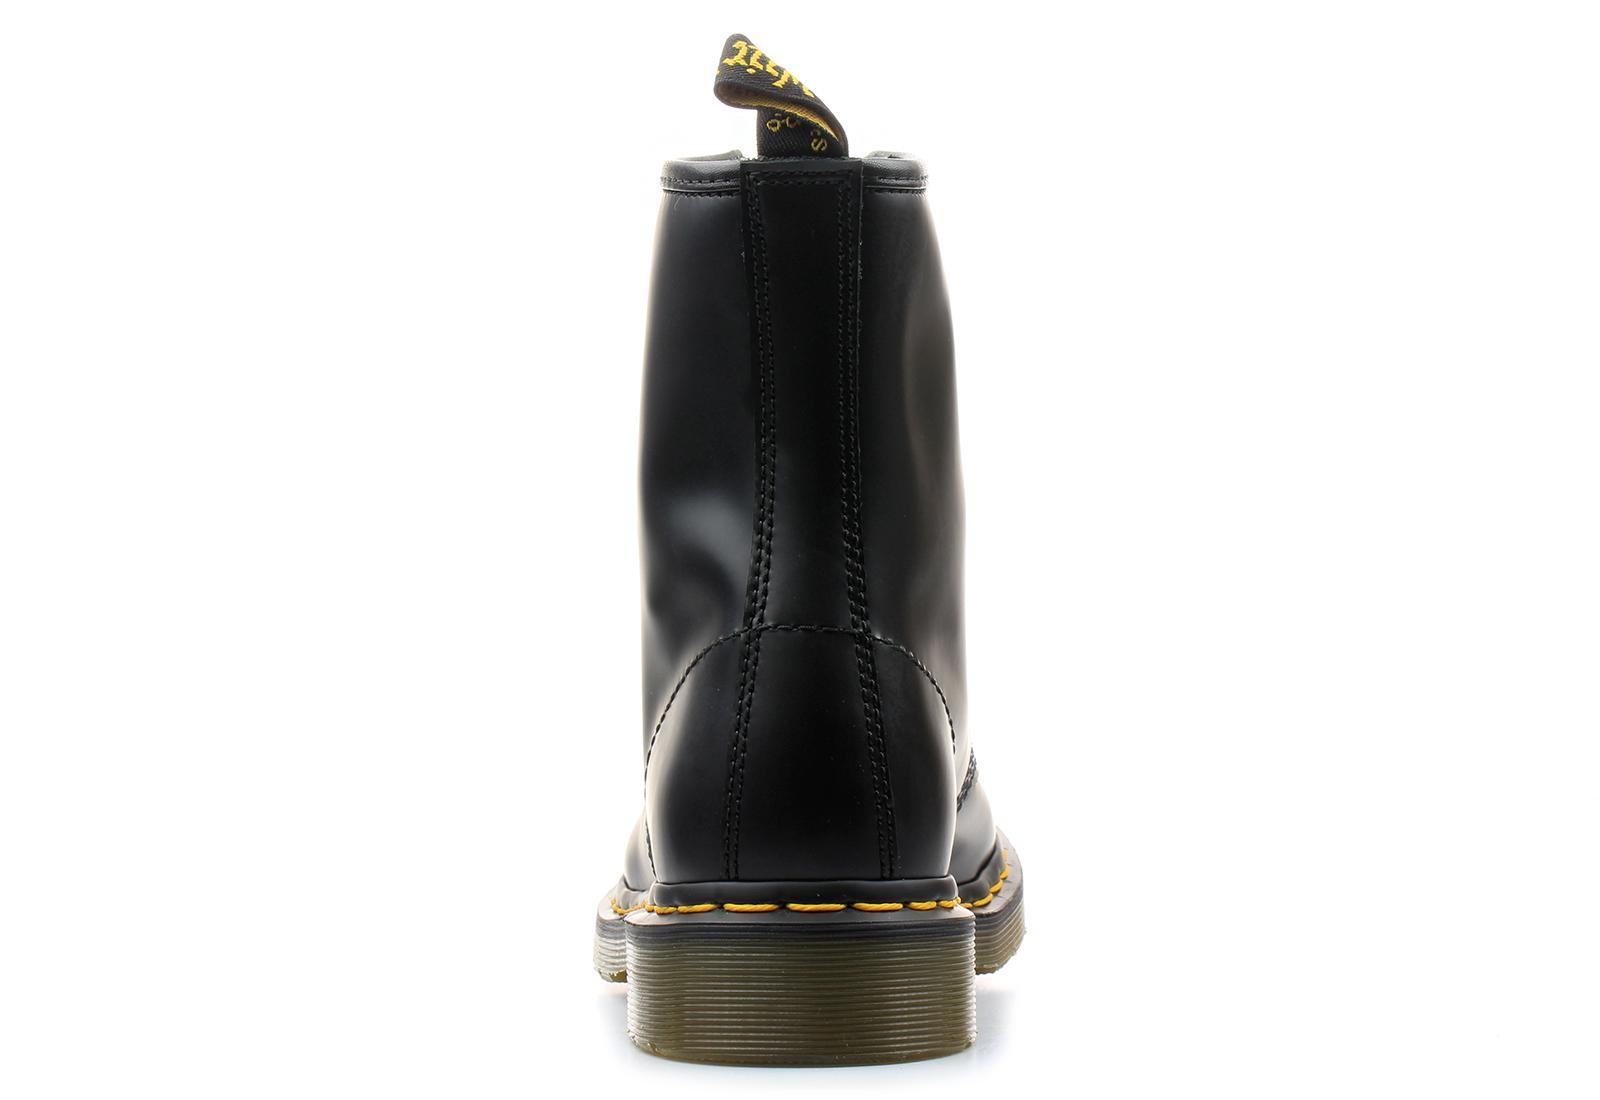 Dr Martens Bakancs - 1460 - 8 Eye Boot - DM11821006 - Office Shoes ... 2ce0b13eac